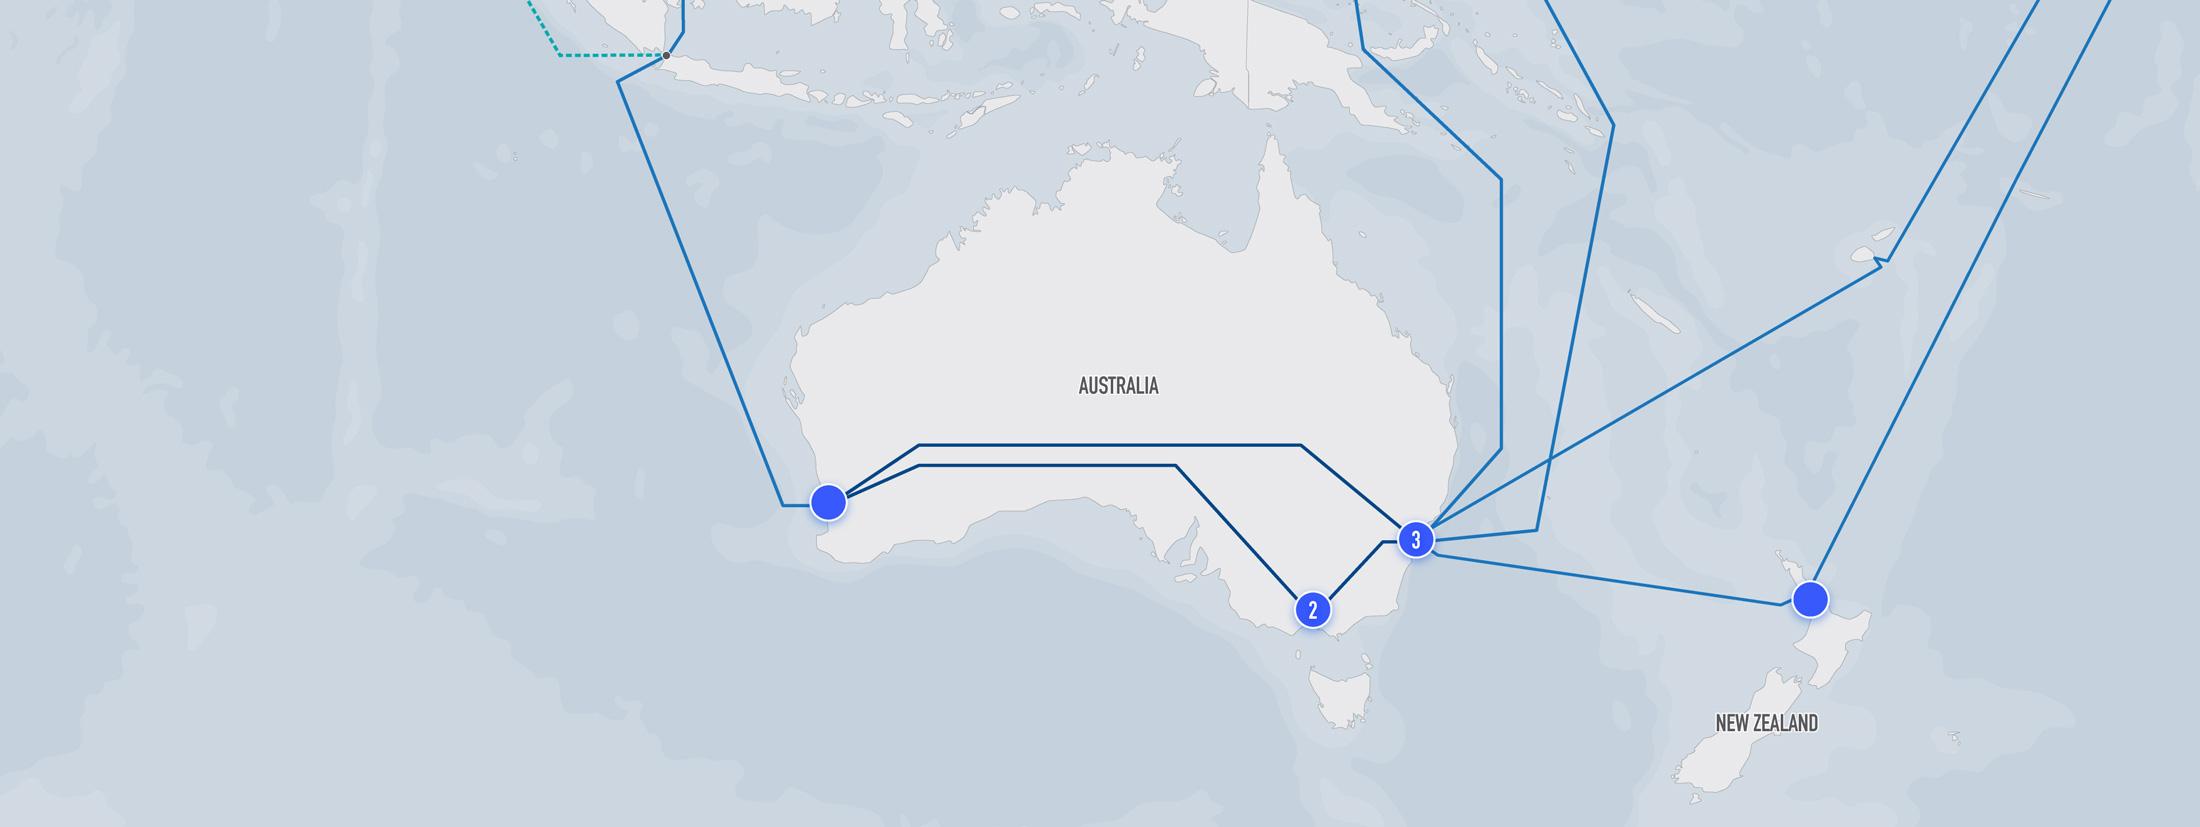 Australia India Map.Network Maps Reliance Communications